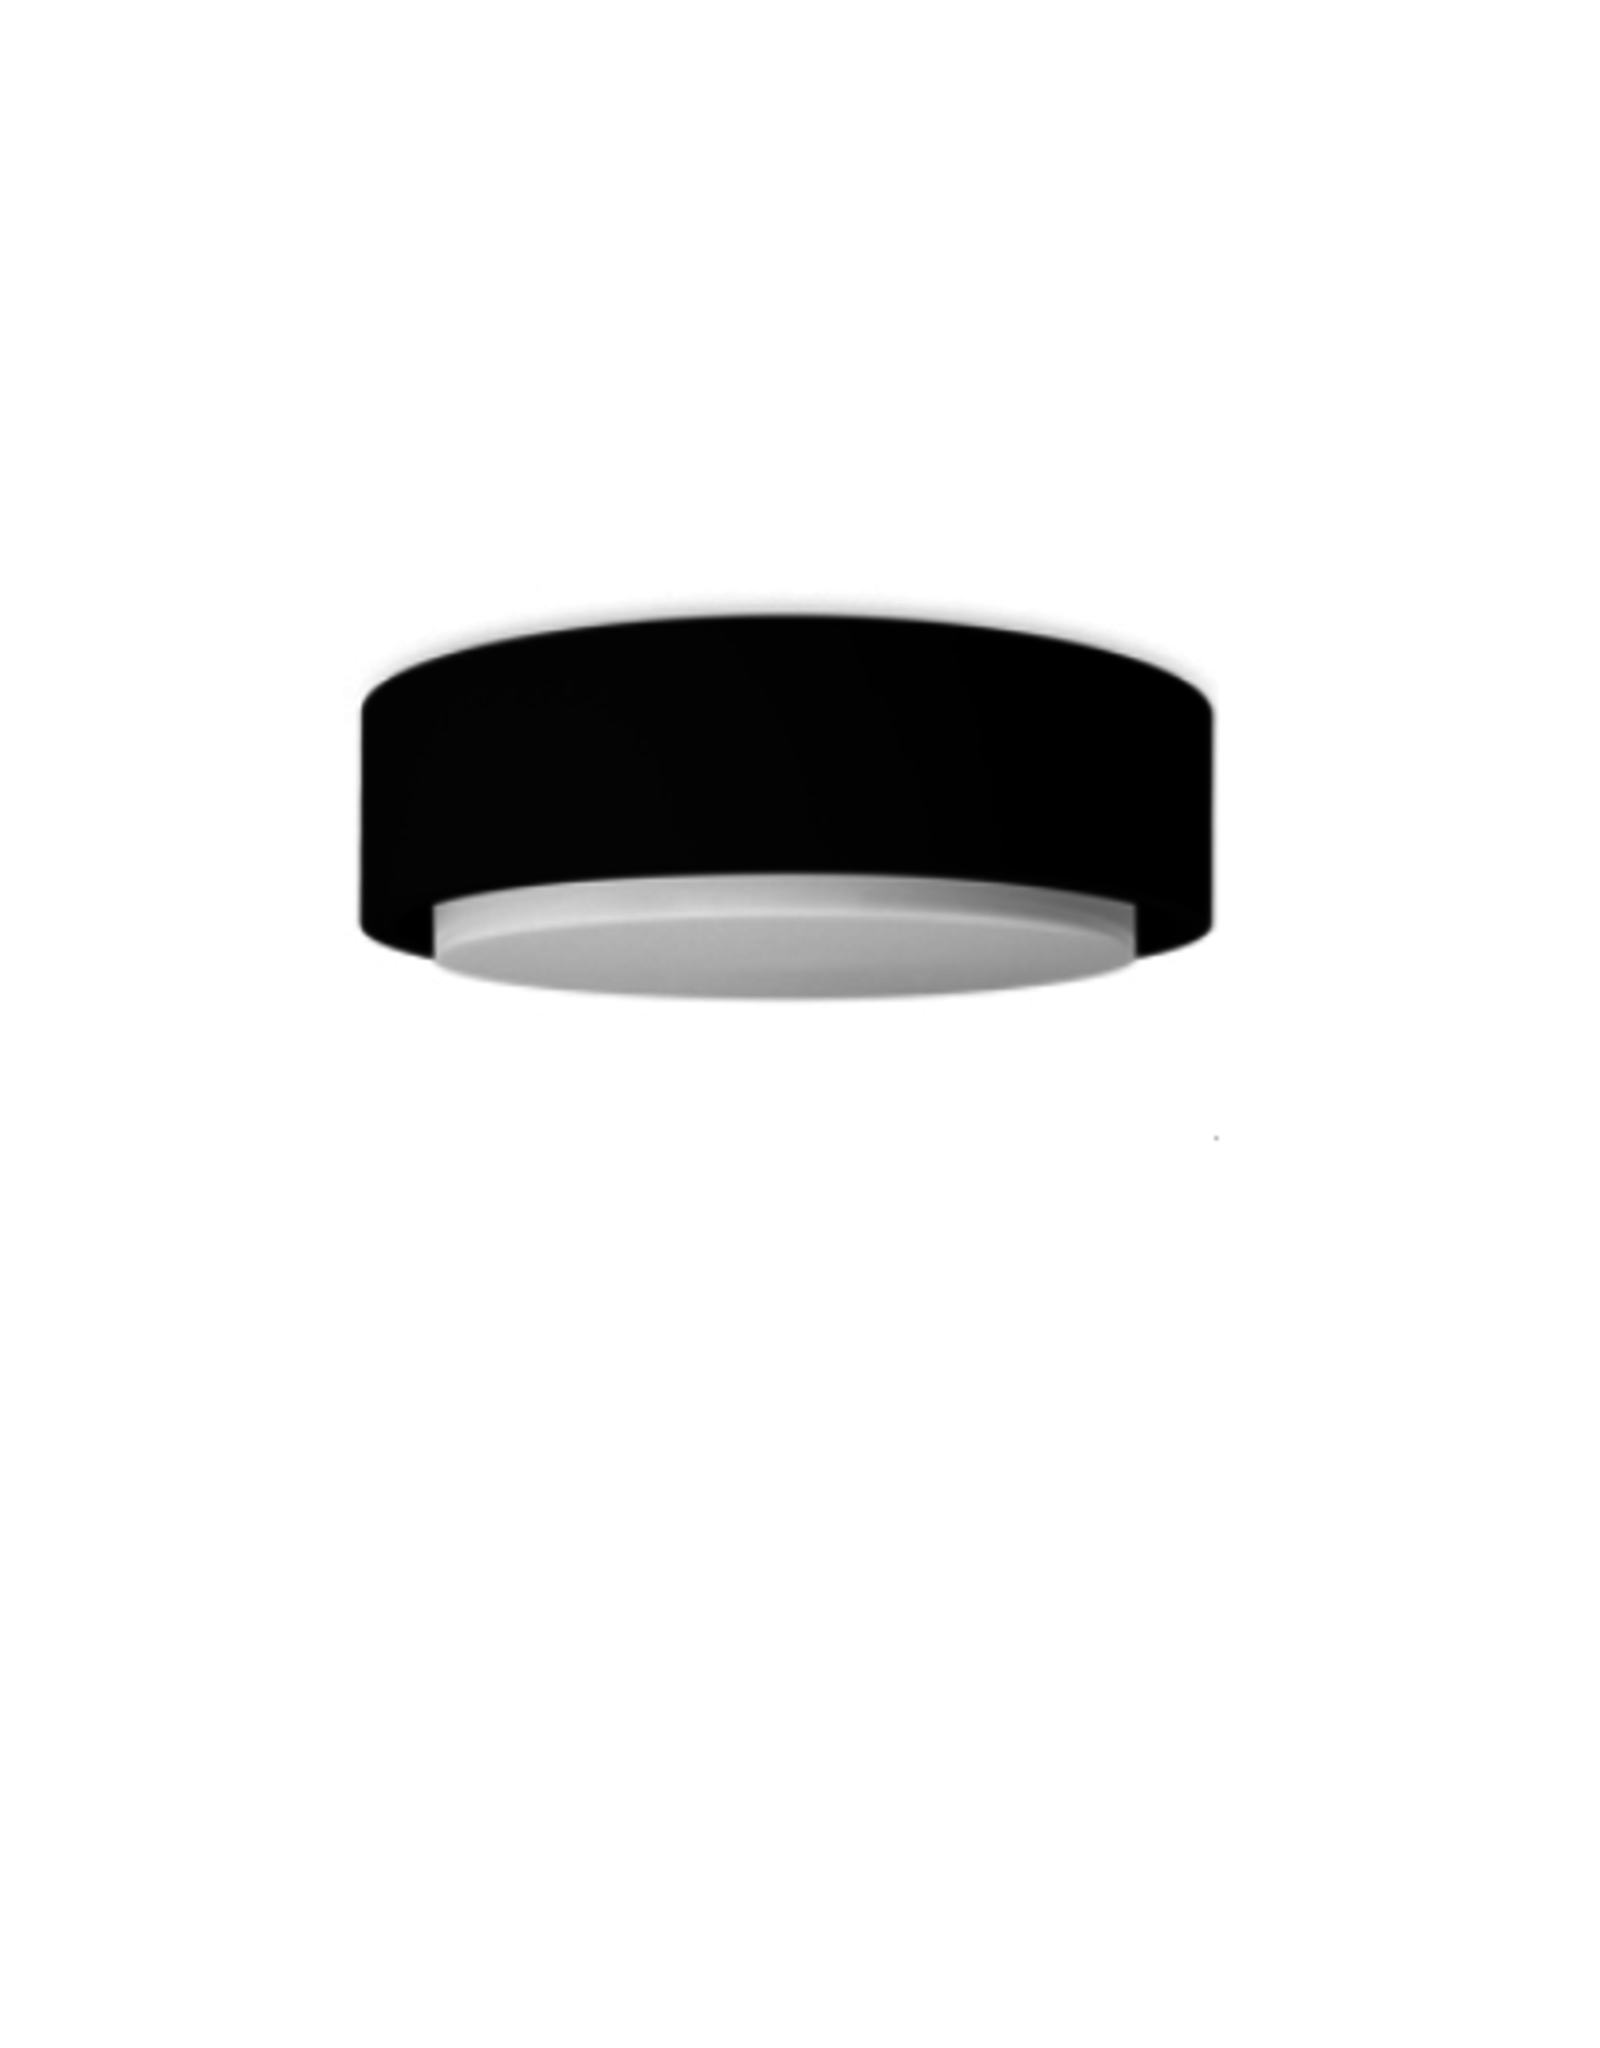 LED plafonniere multi+ 30PC - 3000k - 16W